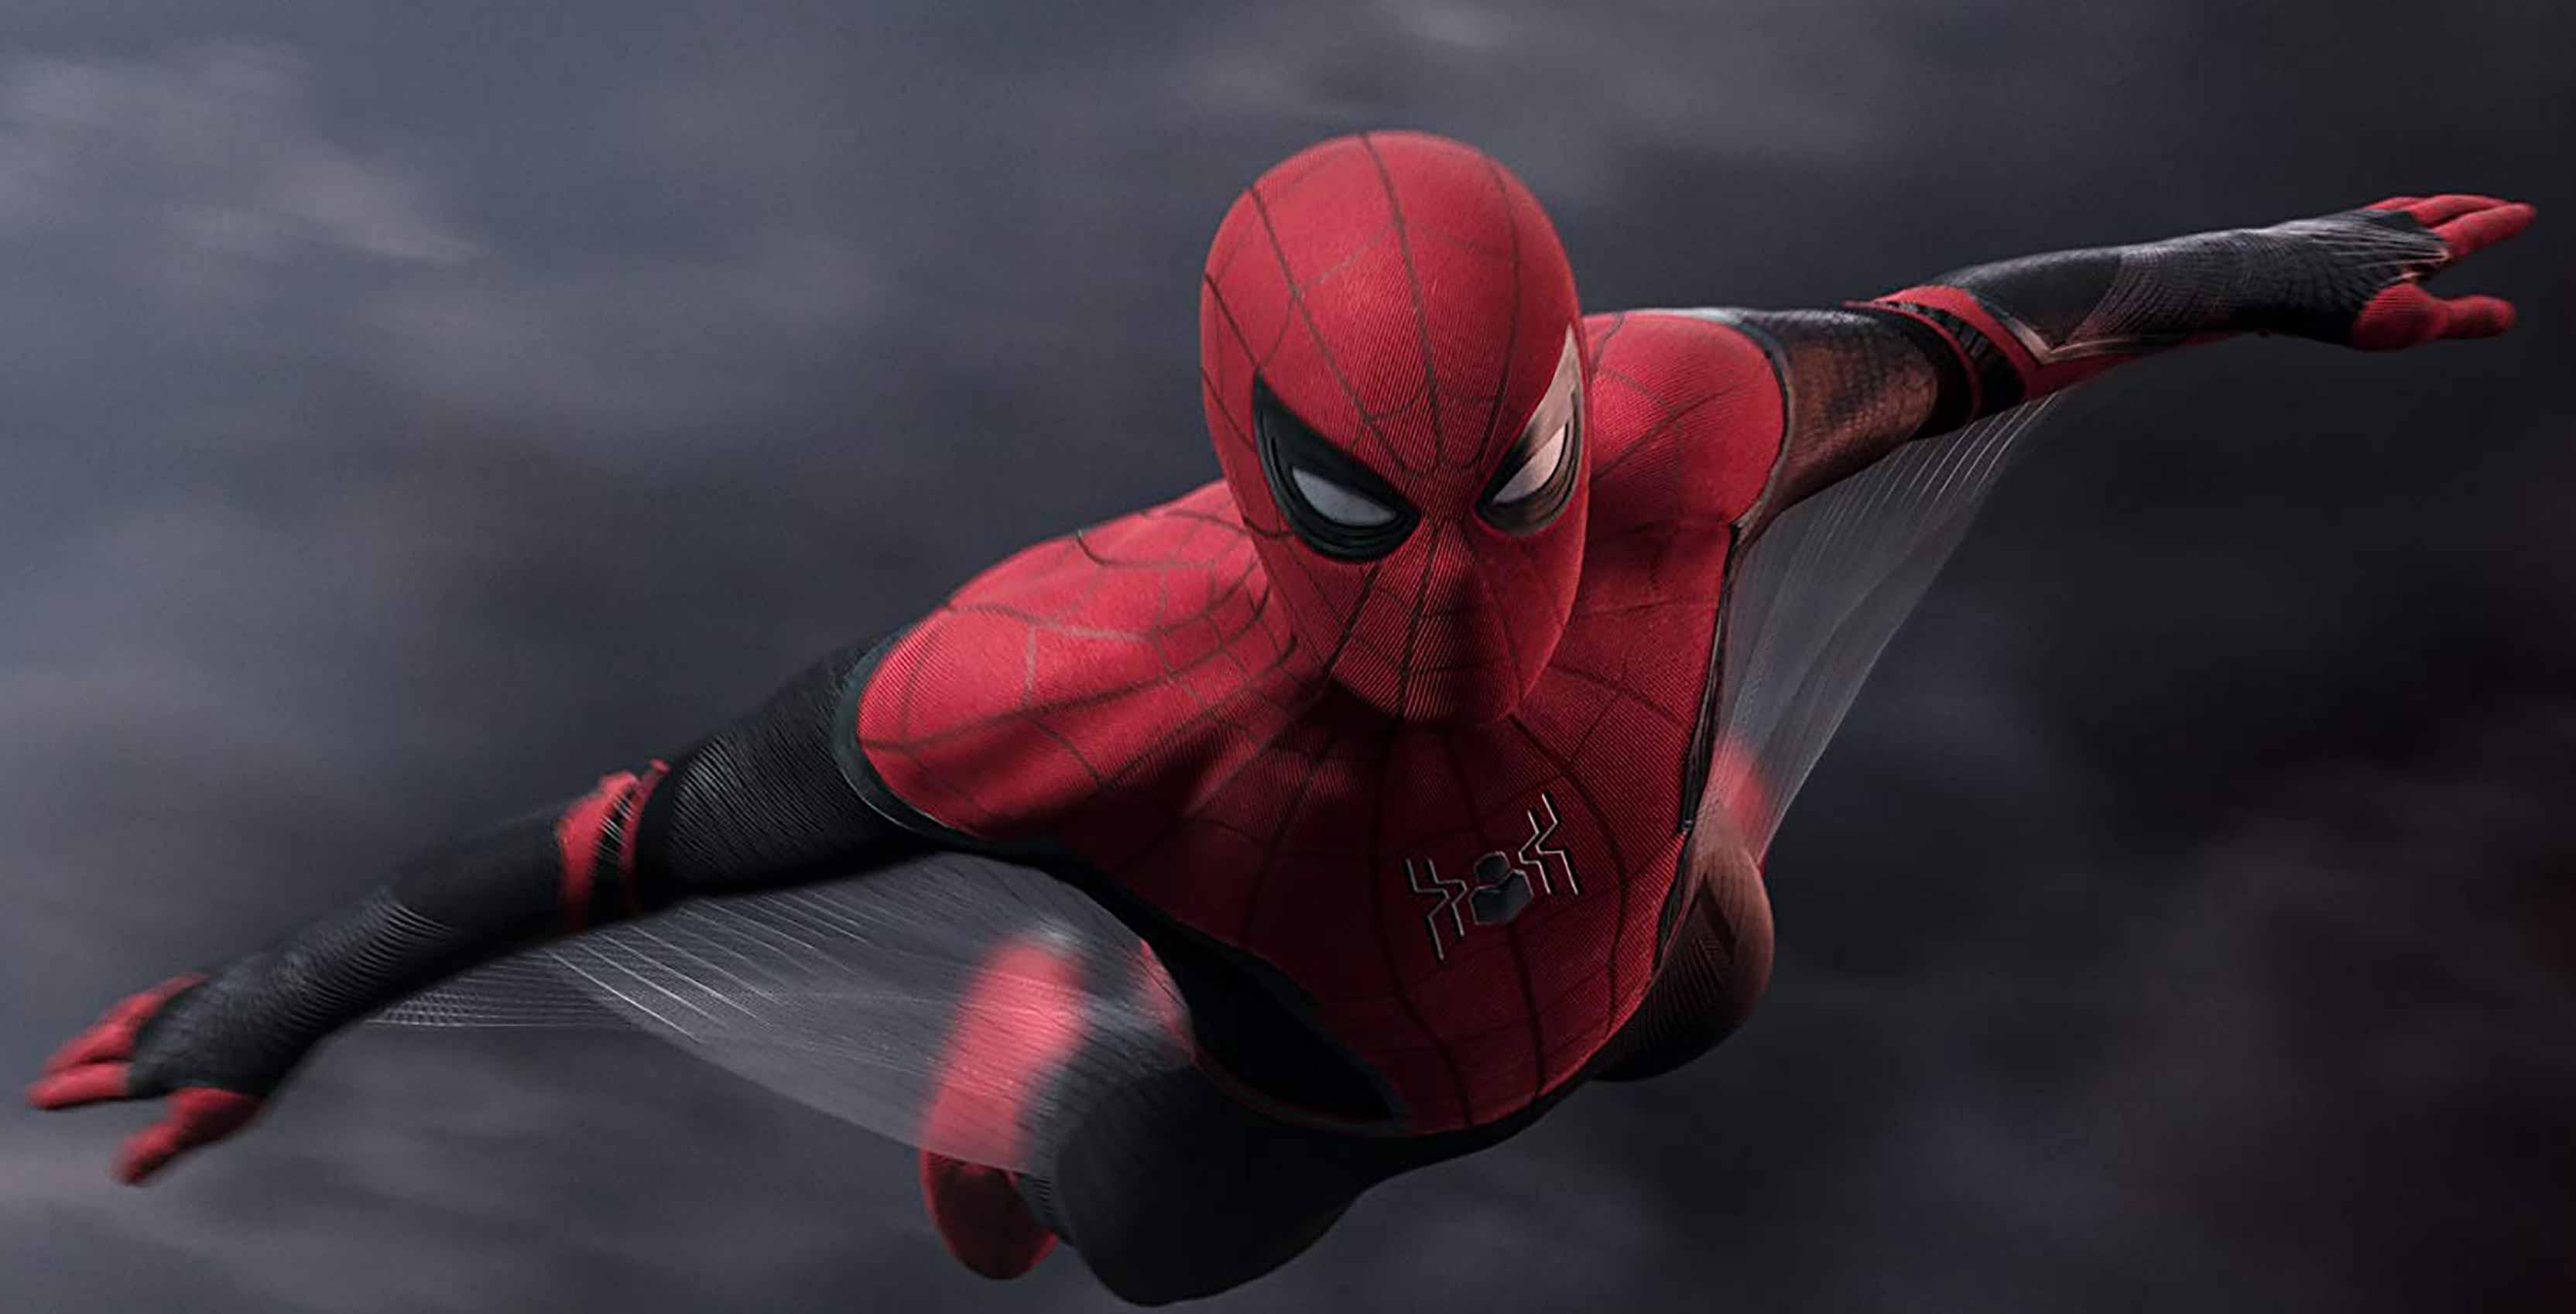 Spider-Man: Far From Home Spidey gliding